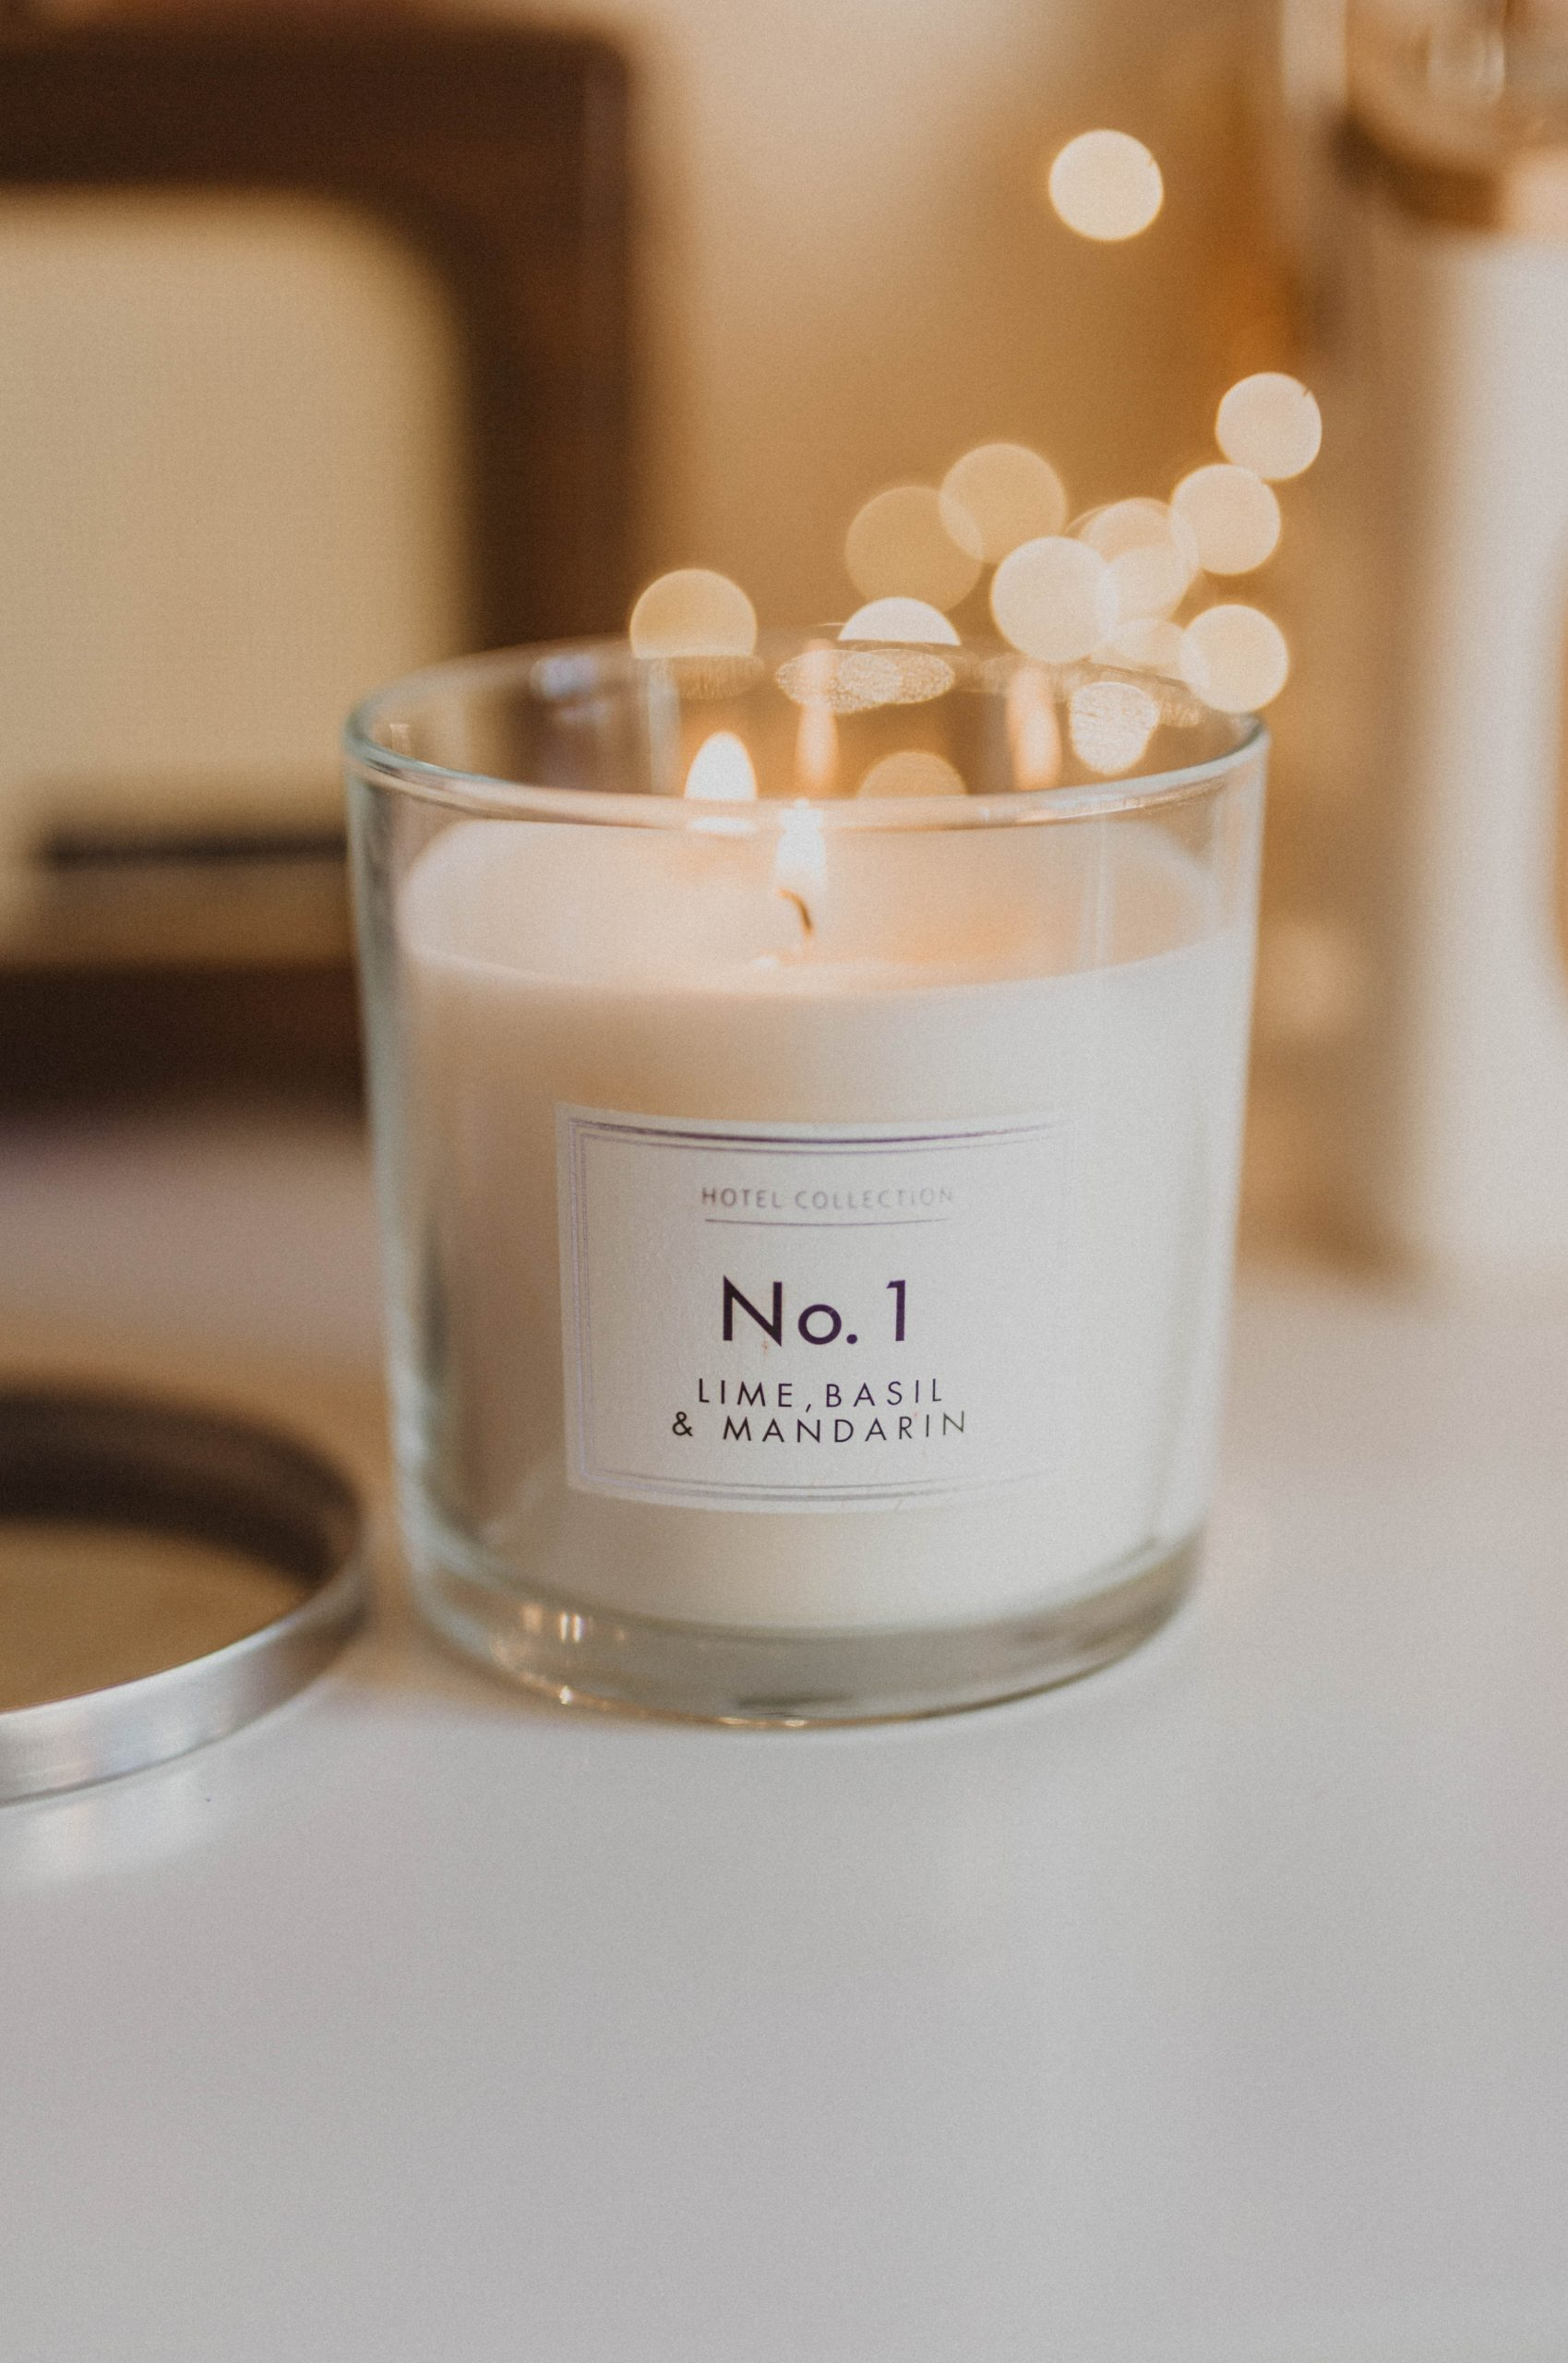 Aldi Candle, Jo Malone Candle dupe, Aldi No. 1 Lime Basil and Mandarin Candle, Cheap candles uk,